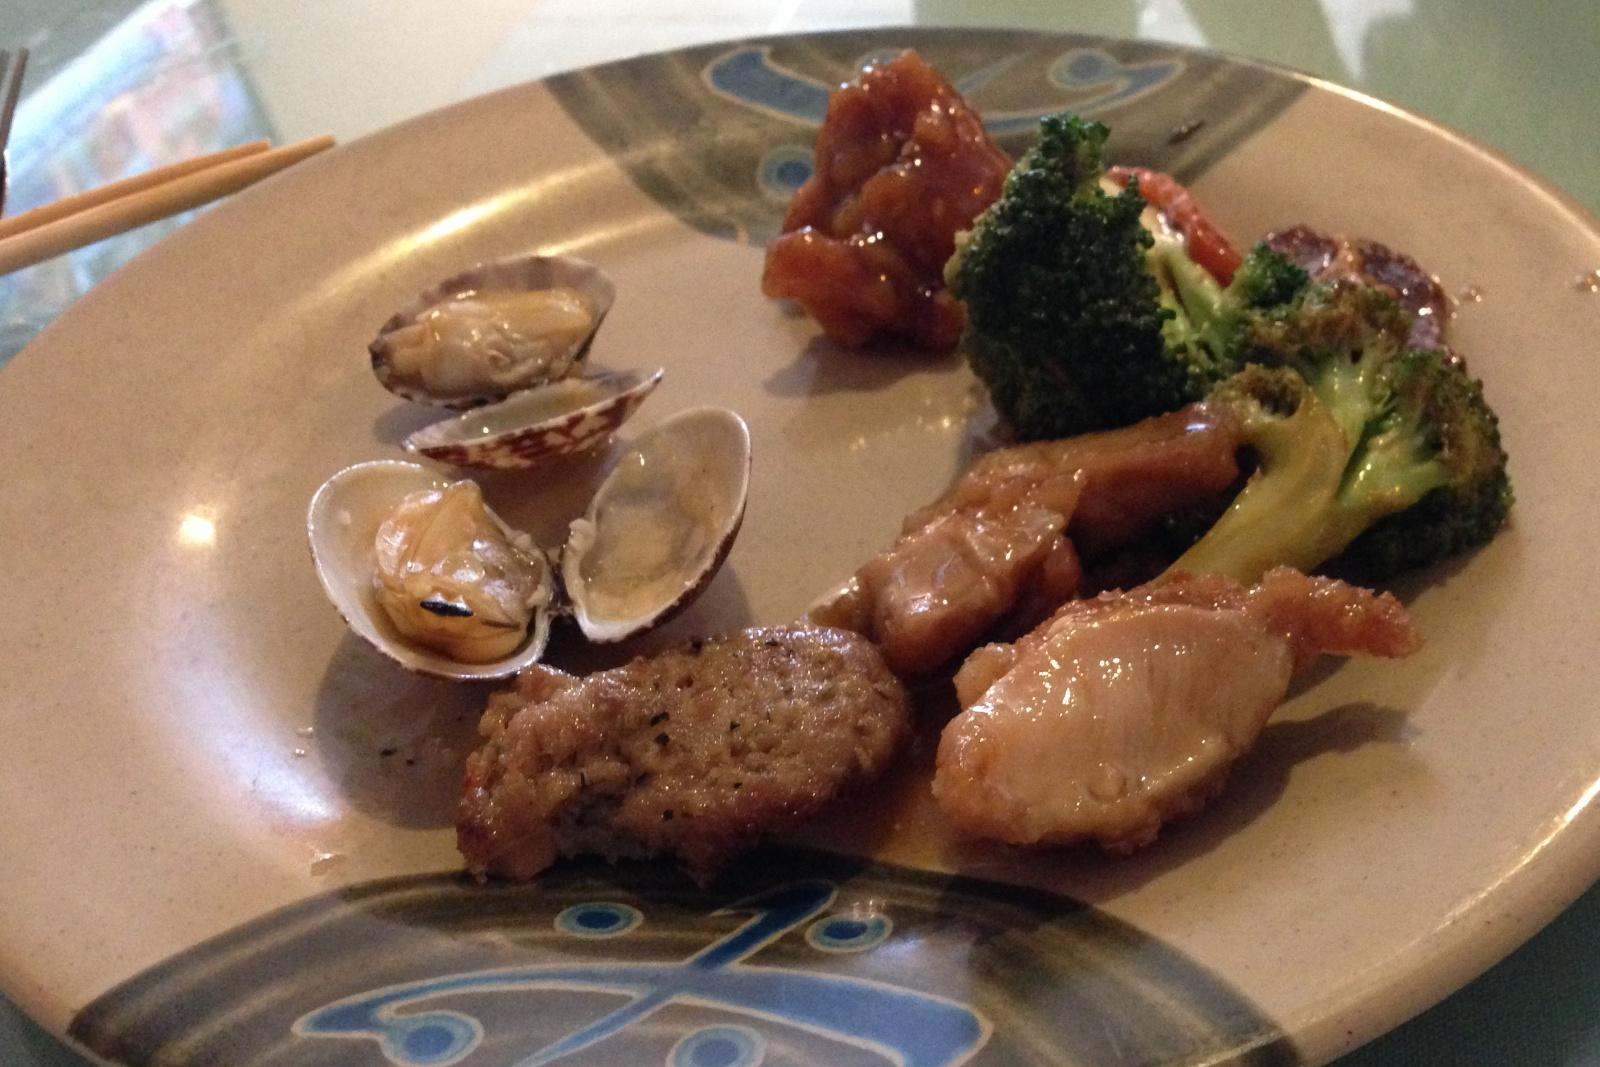 http://blog.rickk.com/food/2013/06/23/ate.2013.06.23.d2.jpg